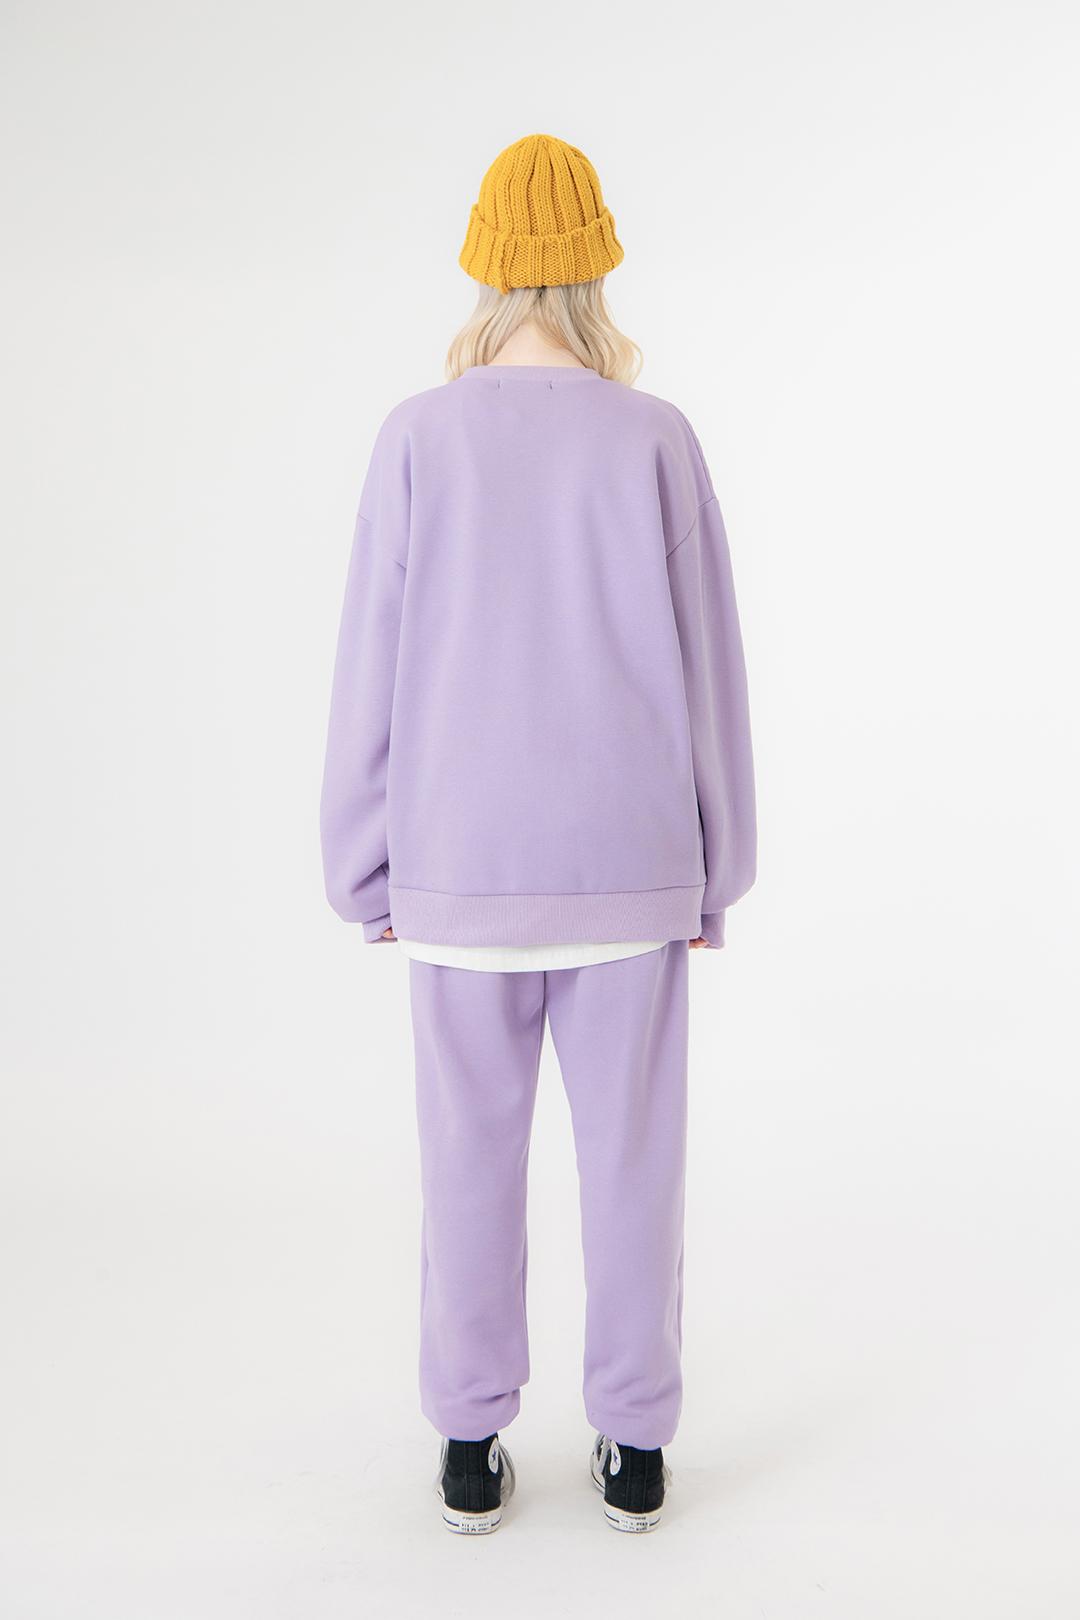 UT8 Street Sweat Shirt UT8 Street Long Pants (Light Purple)SET